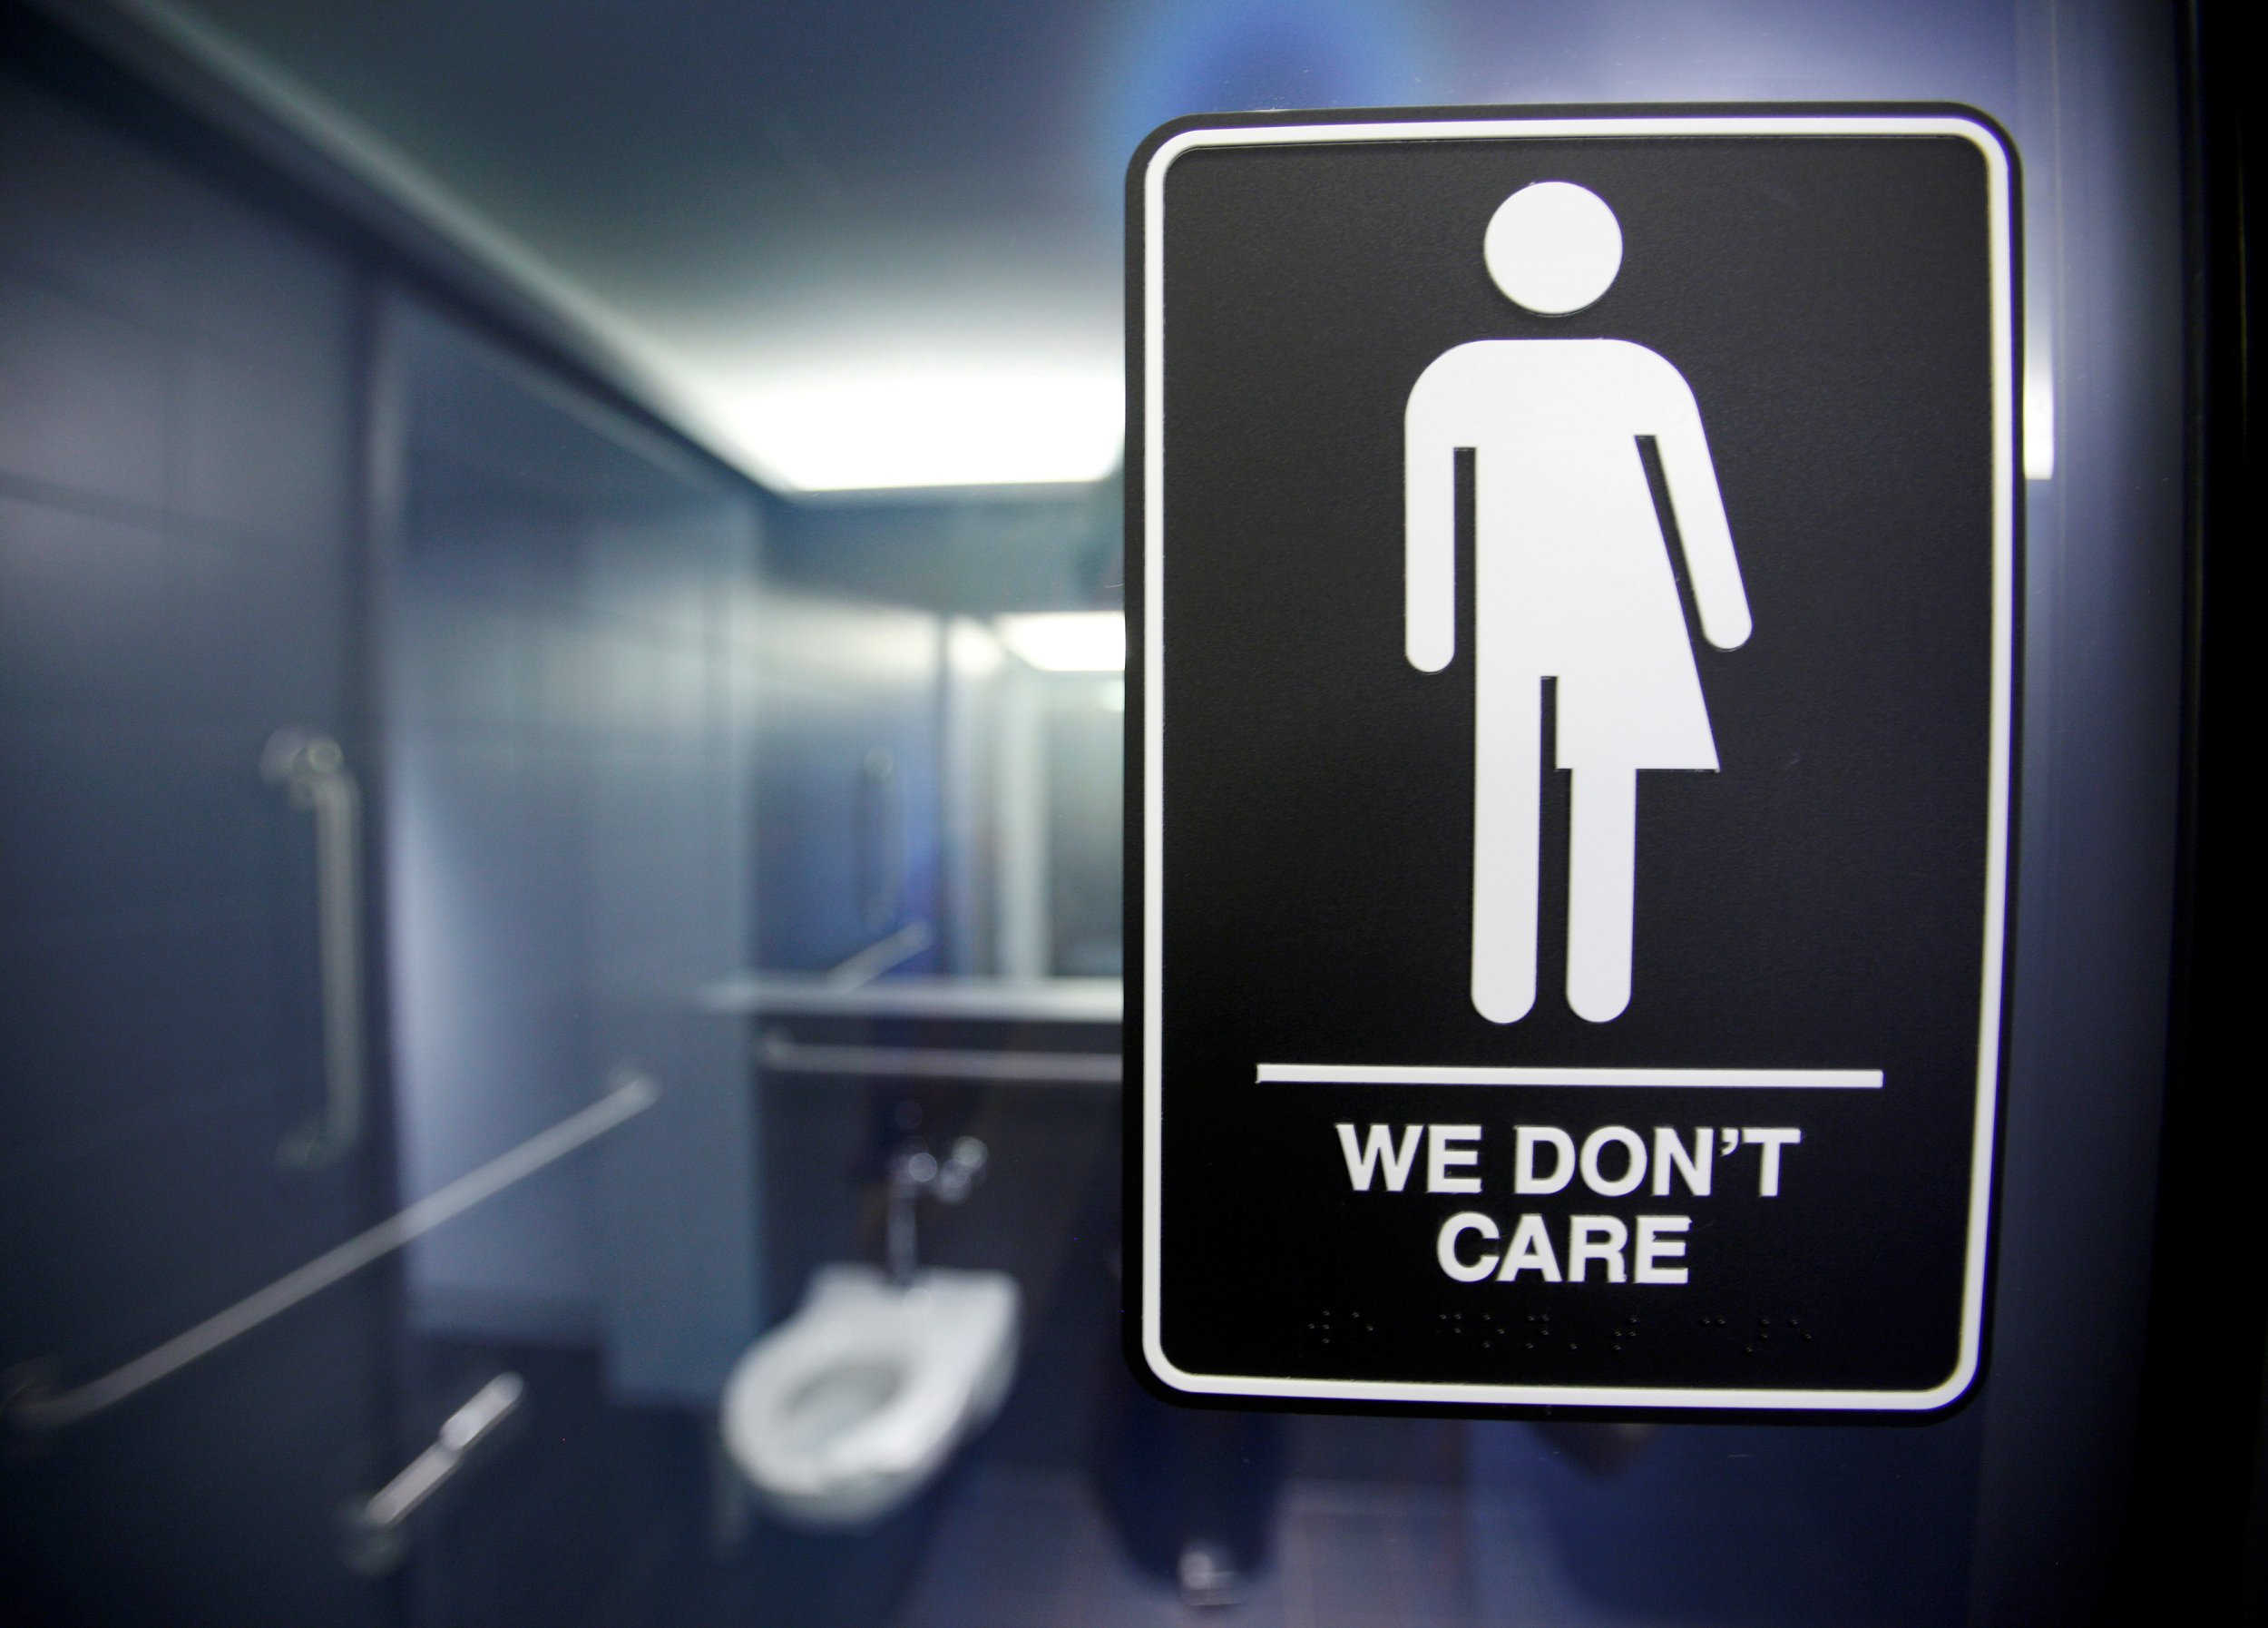 Stupendous Transgender Students Avoid School Bathrooms Despite Health Download Free Architecture Designs Scobabritishbridgeorg